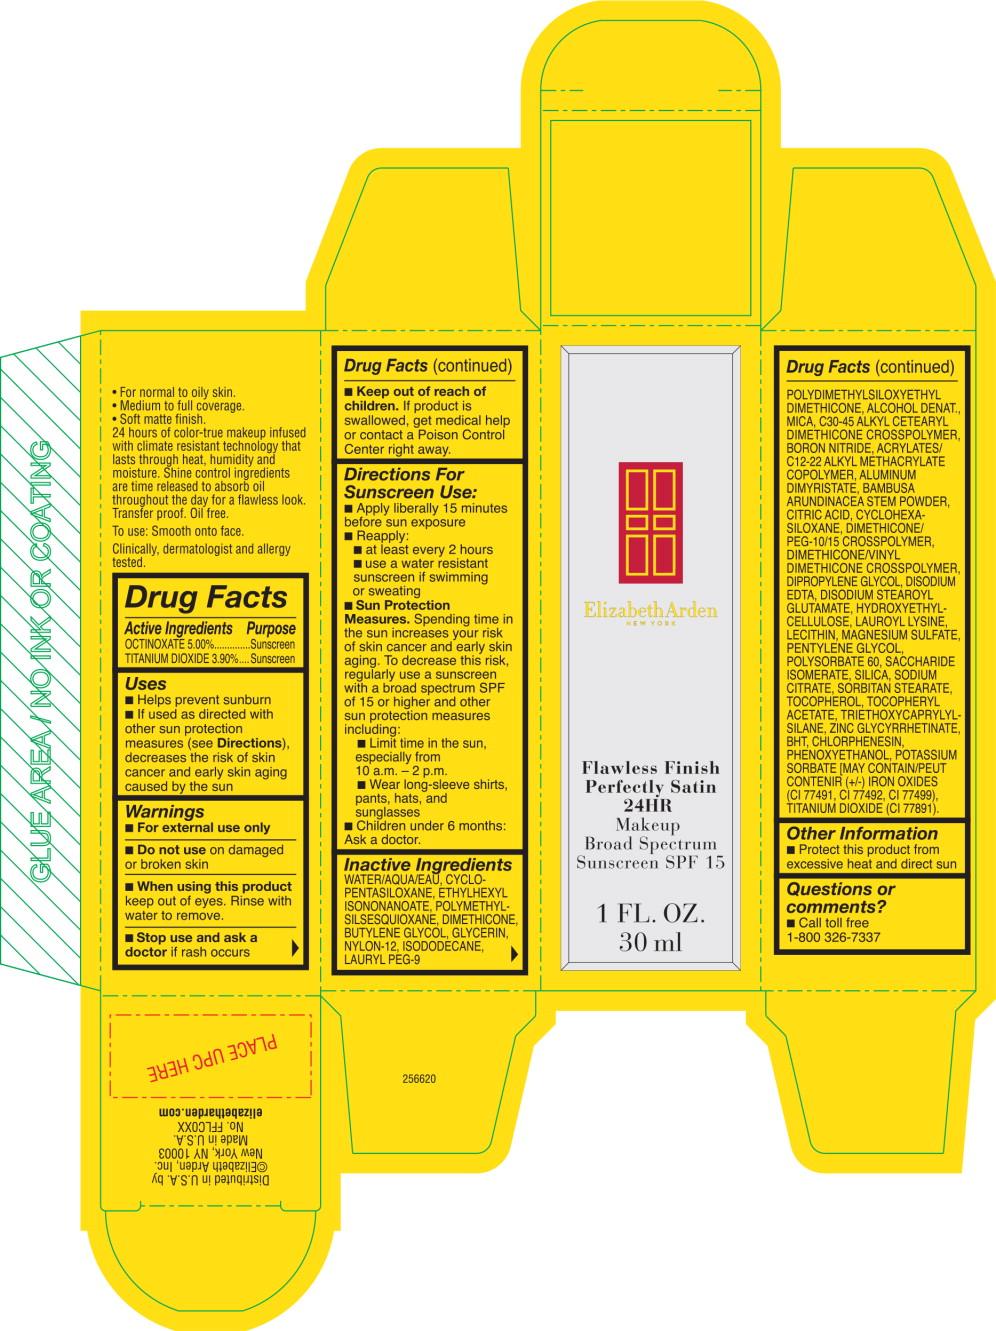 Flawless Finish Perfectly Satinb 24hr Makeup Shade Golden Sands (Octinoxate, Titanium Dioxide) Cream [Elizabeth Arden, Inc]